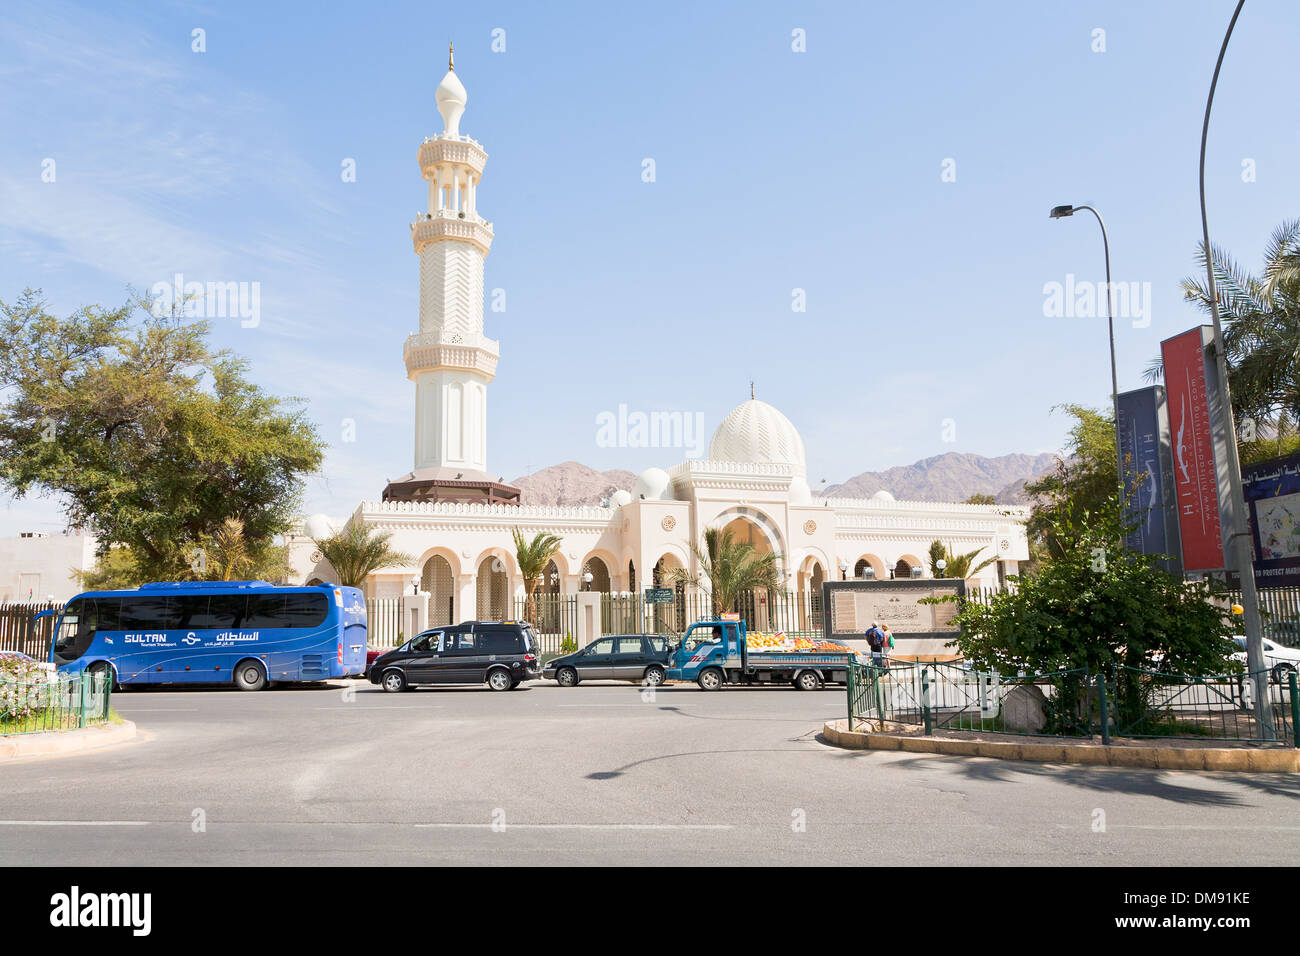 Al-Sharif Al Hussein Bin Ali Mosque in Aqaba - Stock Image